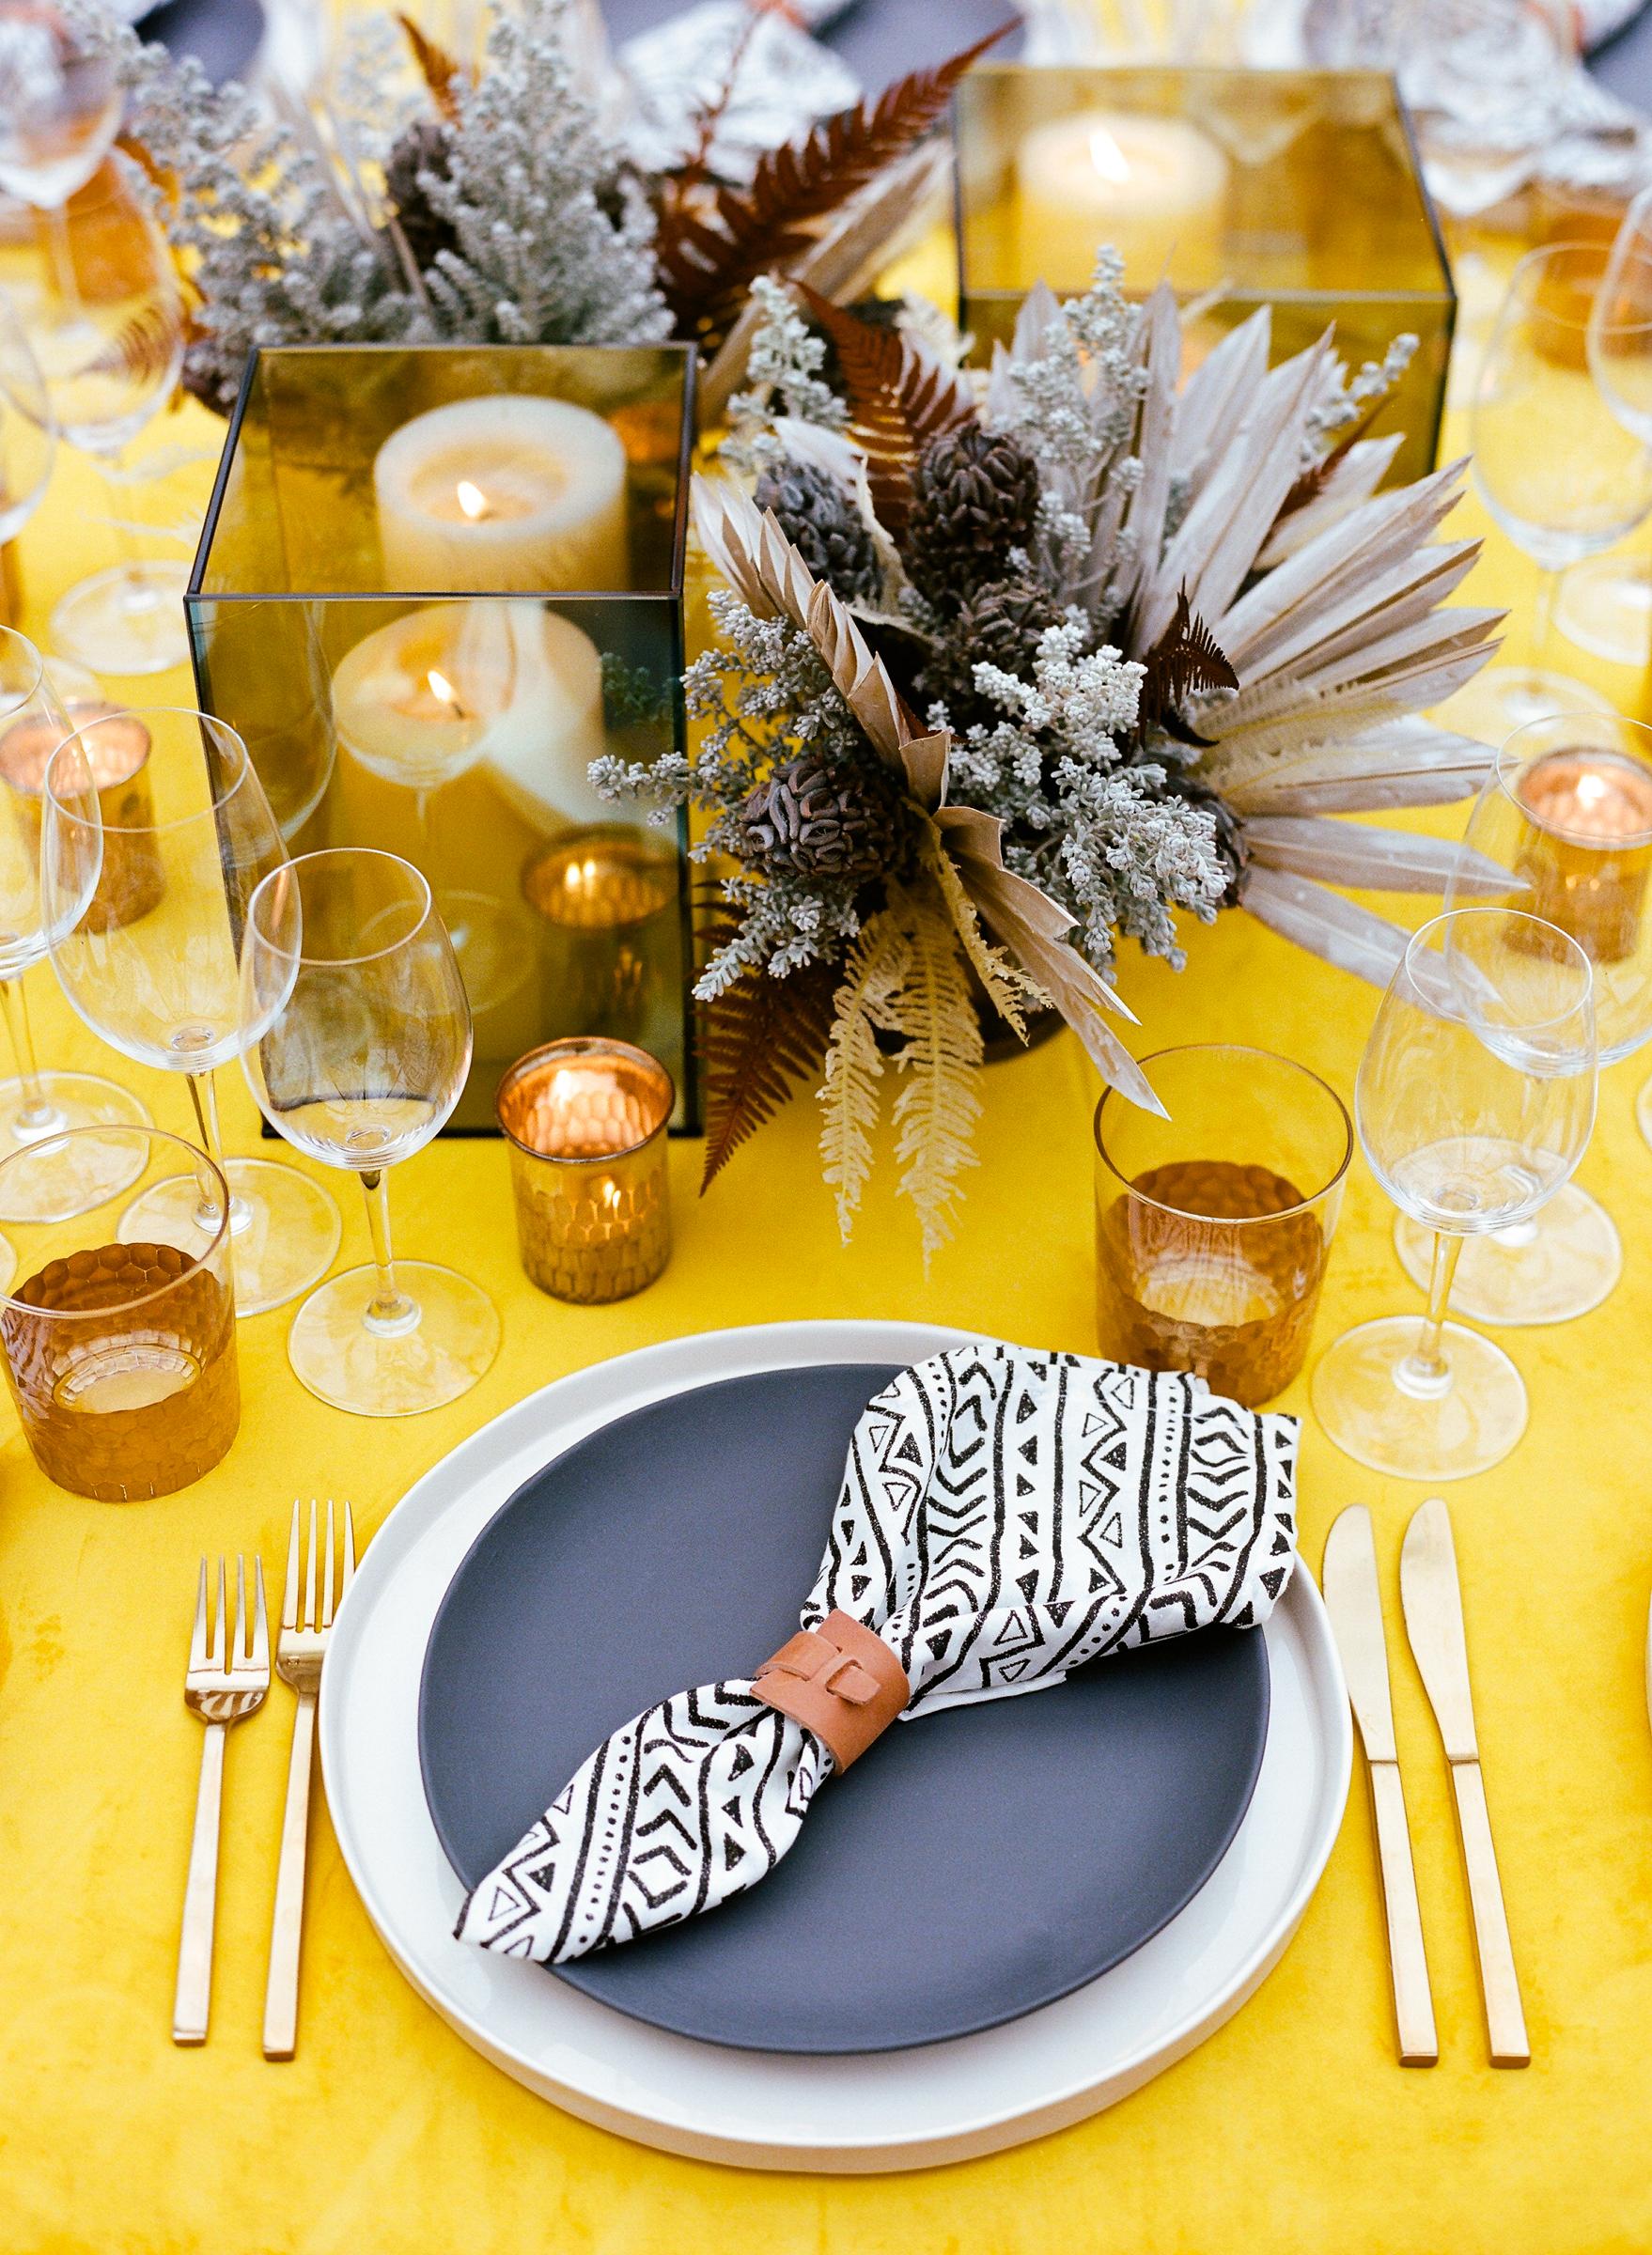 hamida charlie charleson wedding welcome party centerpiece dried